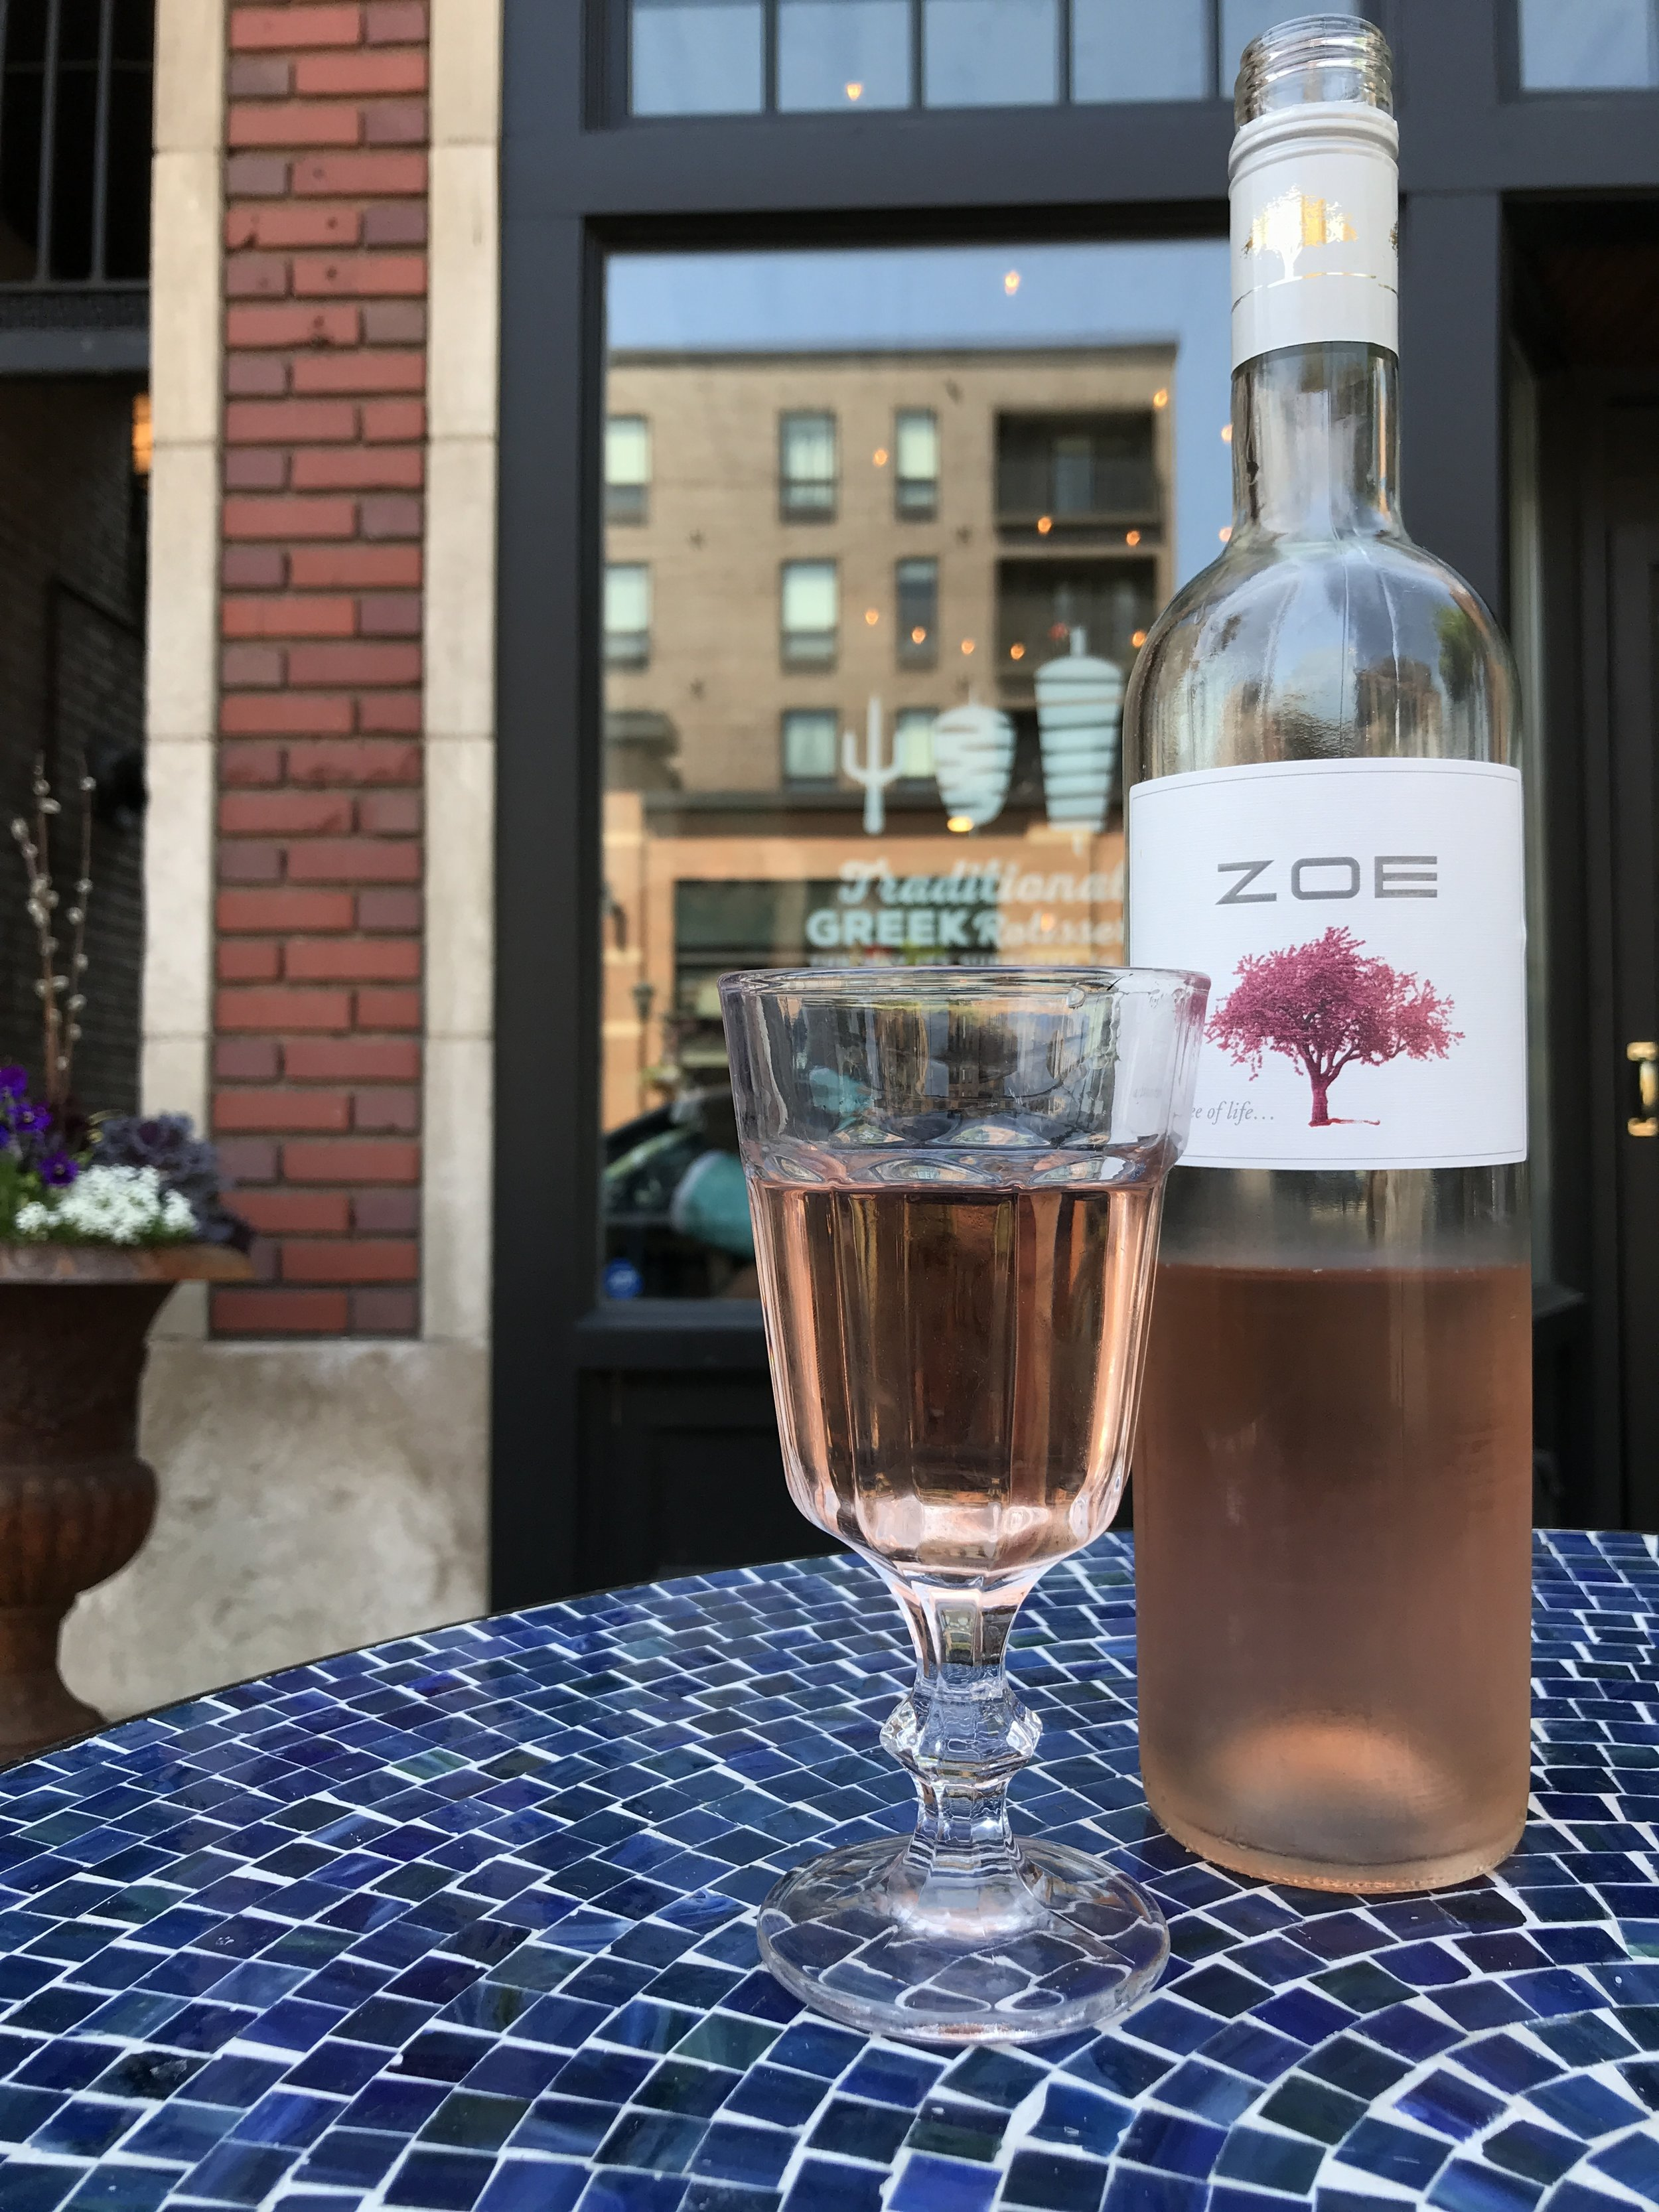 The_Naughty_Greek_Greek_Wine_Zoe_Domaine_Skouras_Rosé.JPG